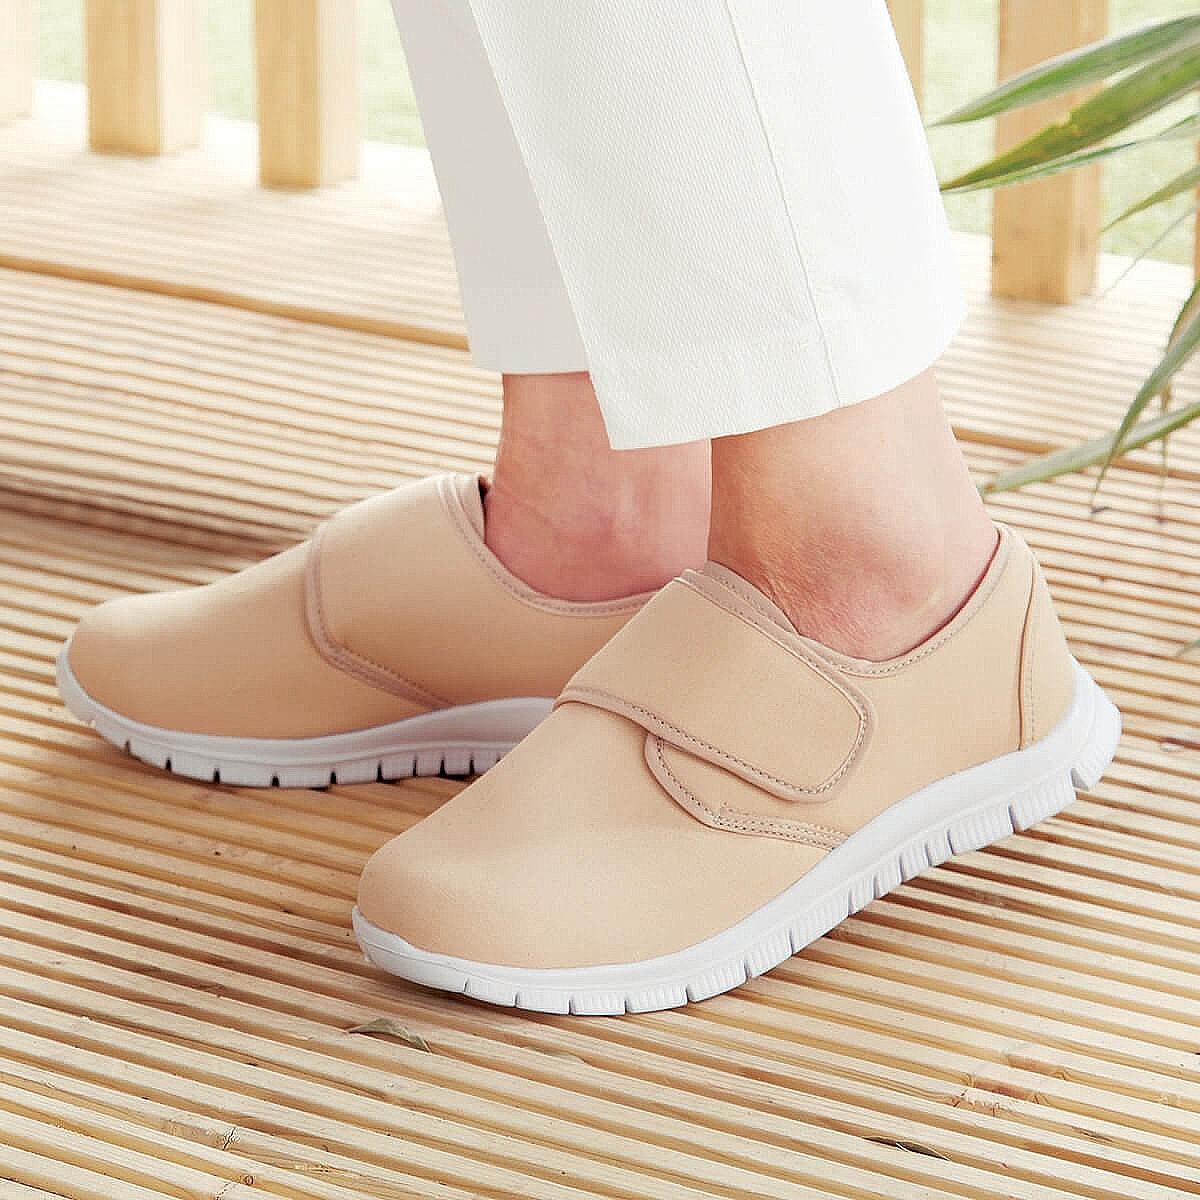 Mens Blue Canvas Shoes: simple touch